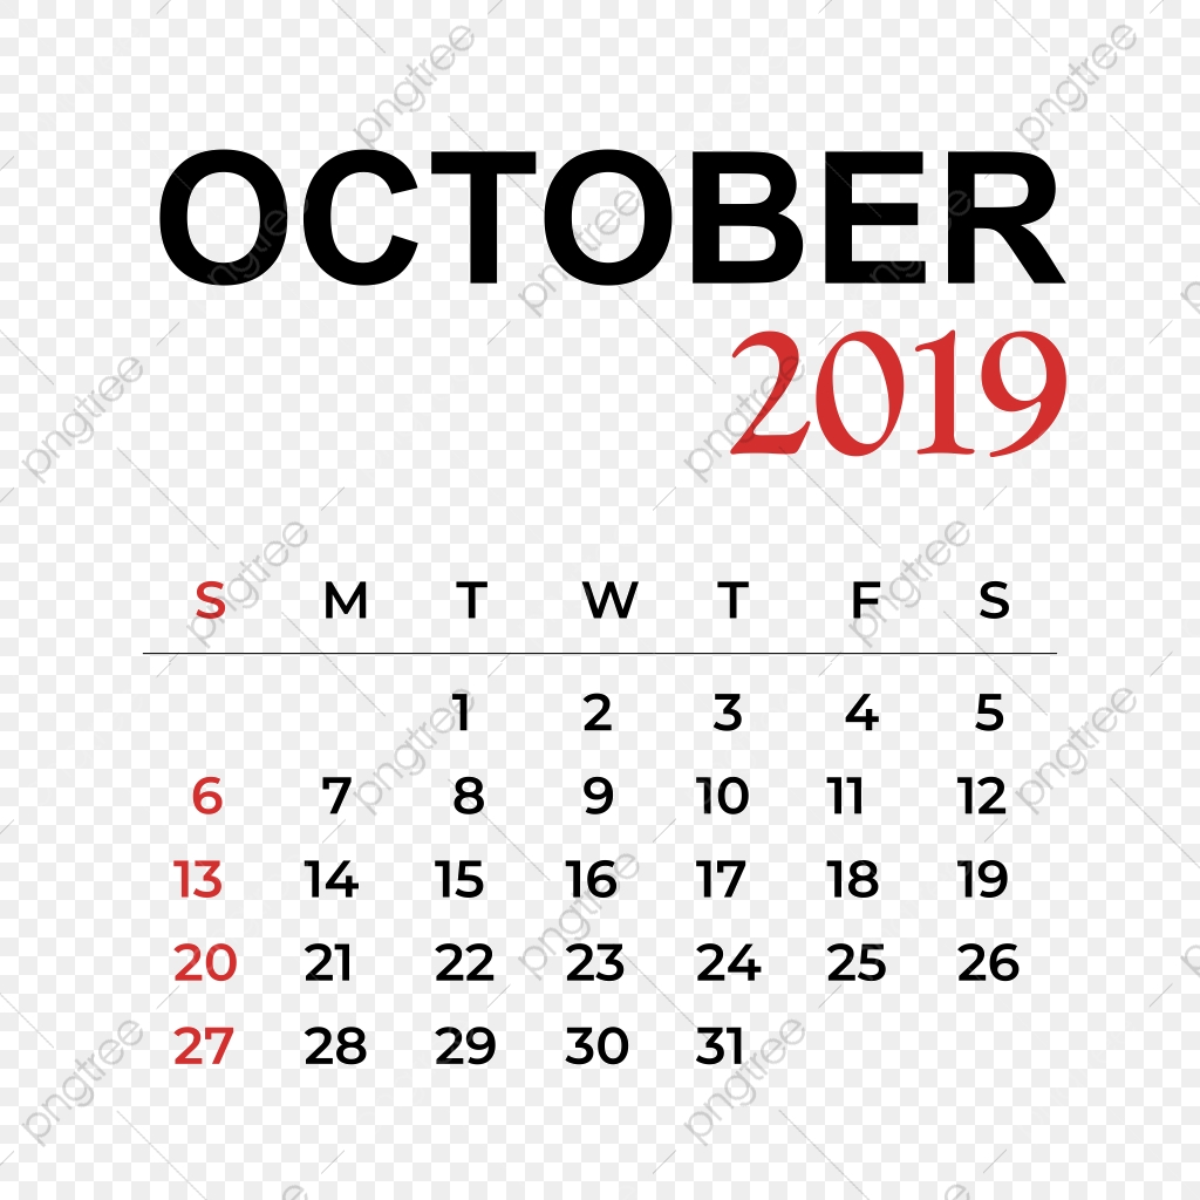 Octobre Calendrier 2019.Calendrier Du Mois De Octobre 2019 Calendrier Vecteur